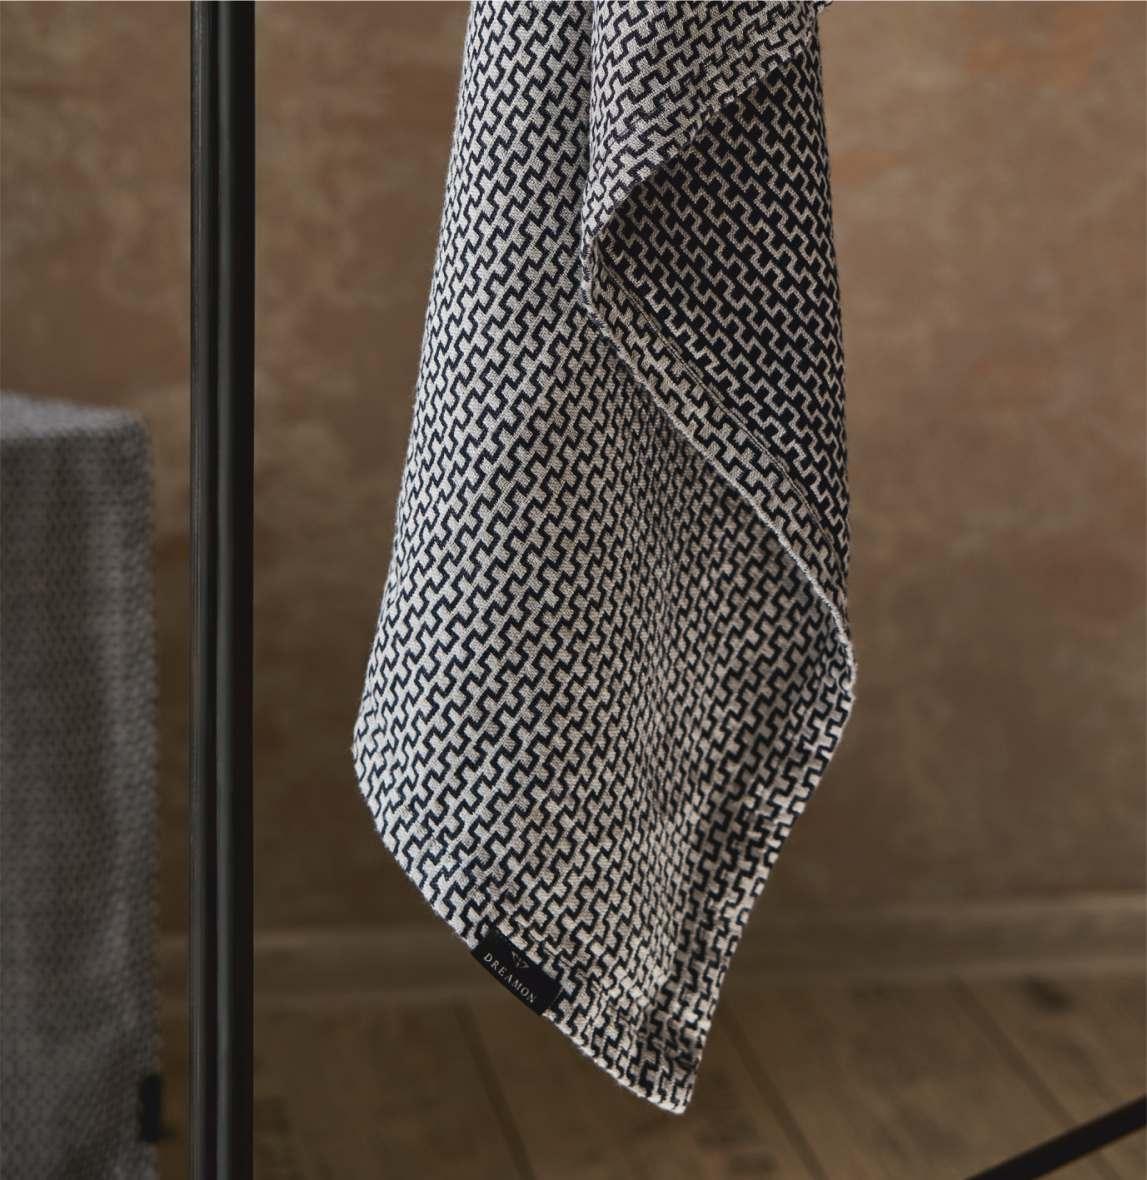 Image of Labyrinth køkkenhåndklæde